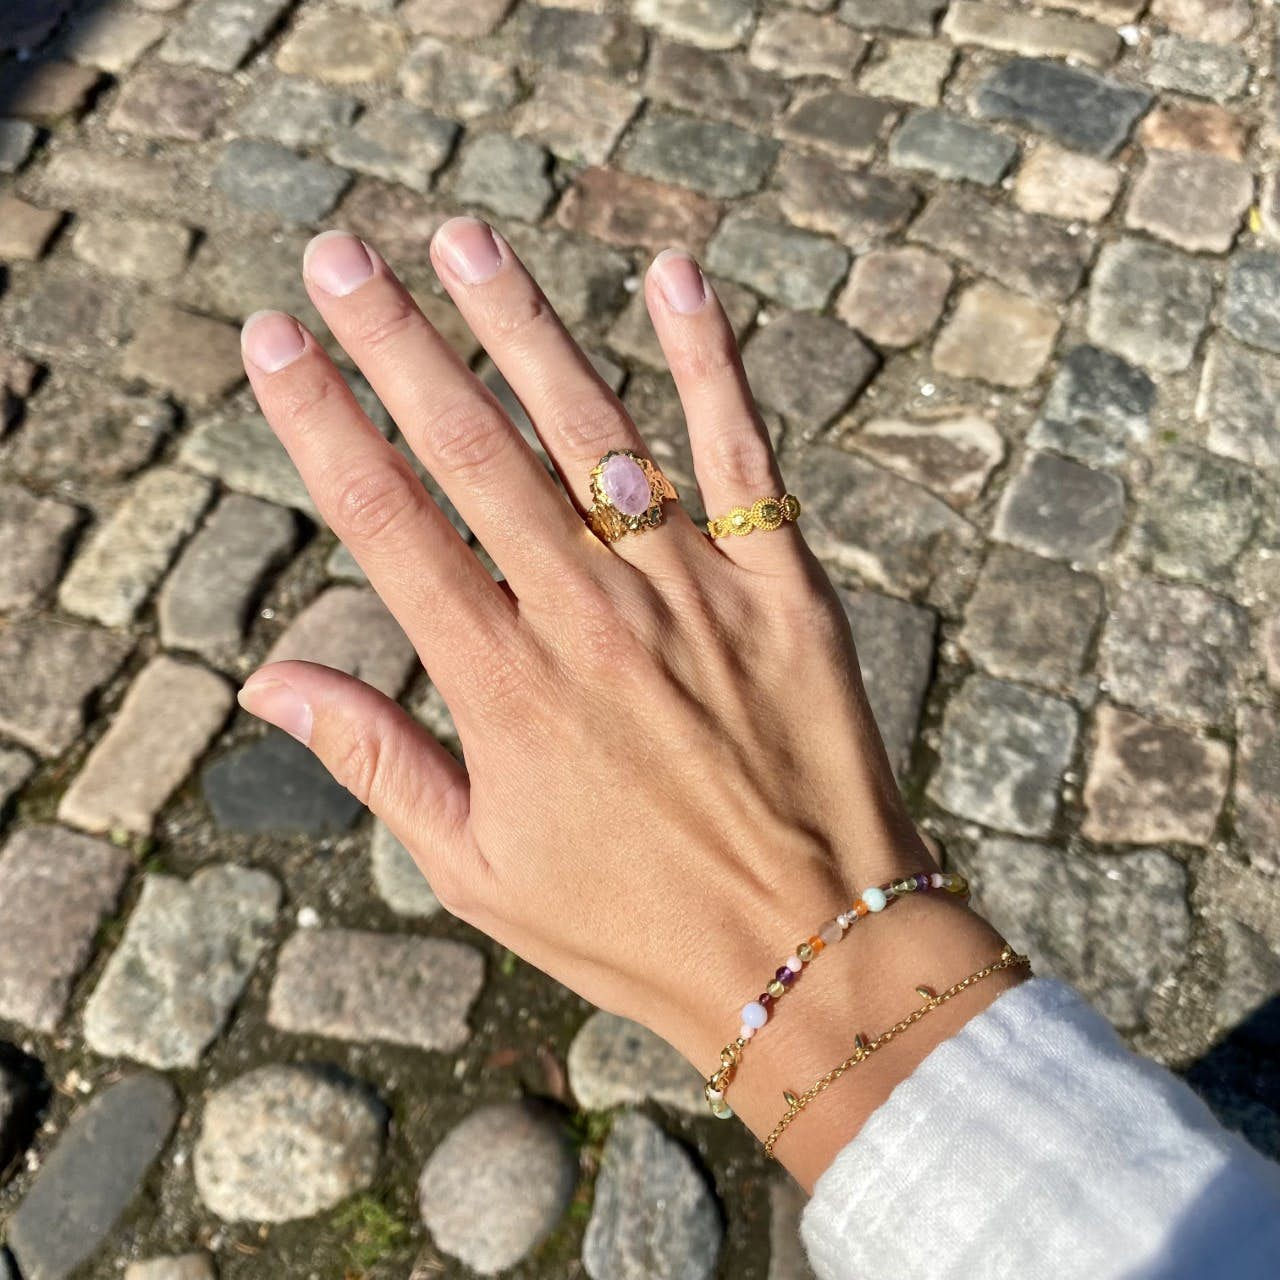 Pendul Bracelet von Maanesten in Vergoldet-Silber Sterling 925